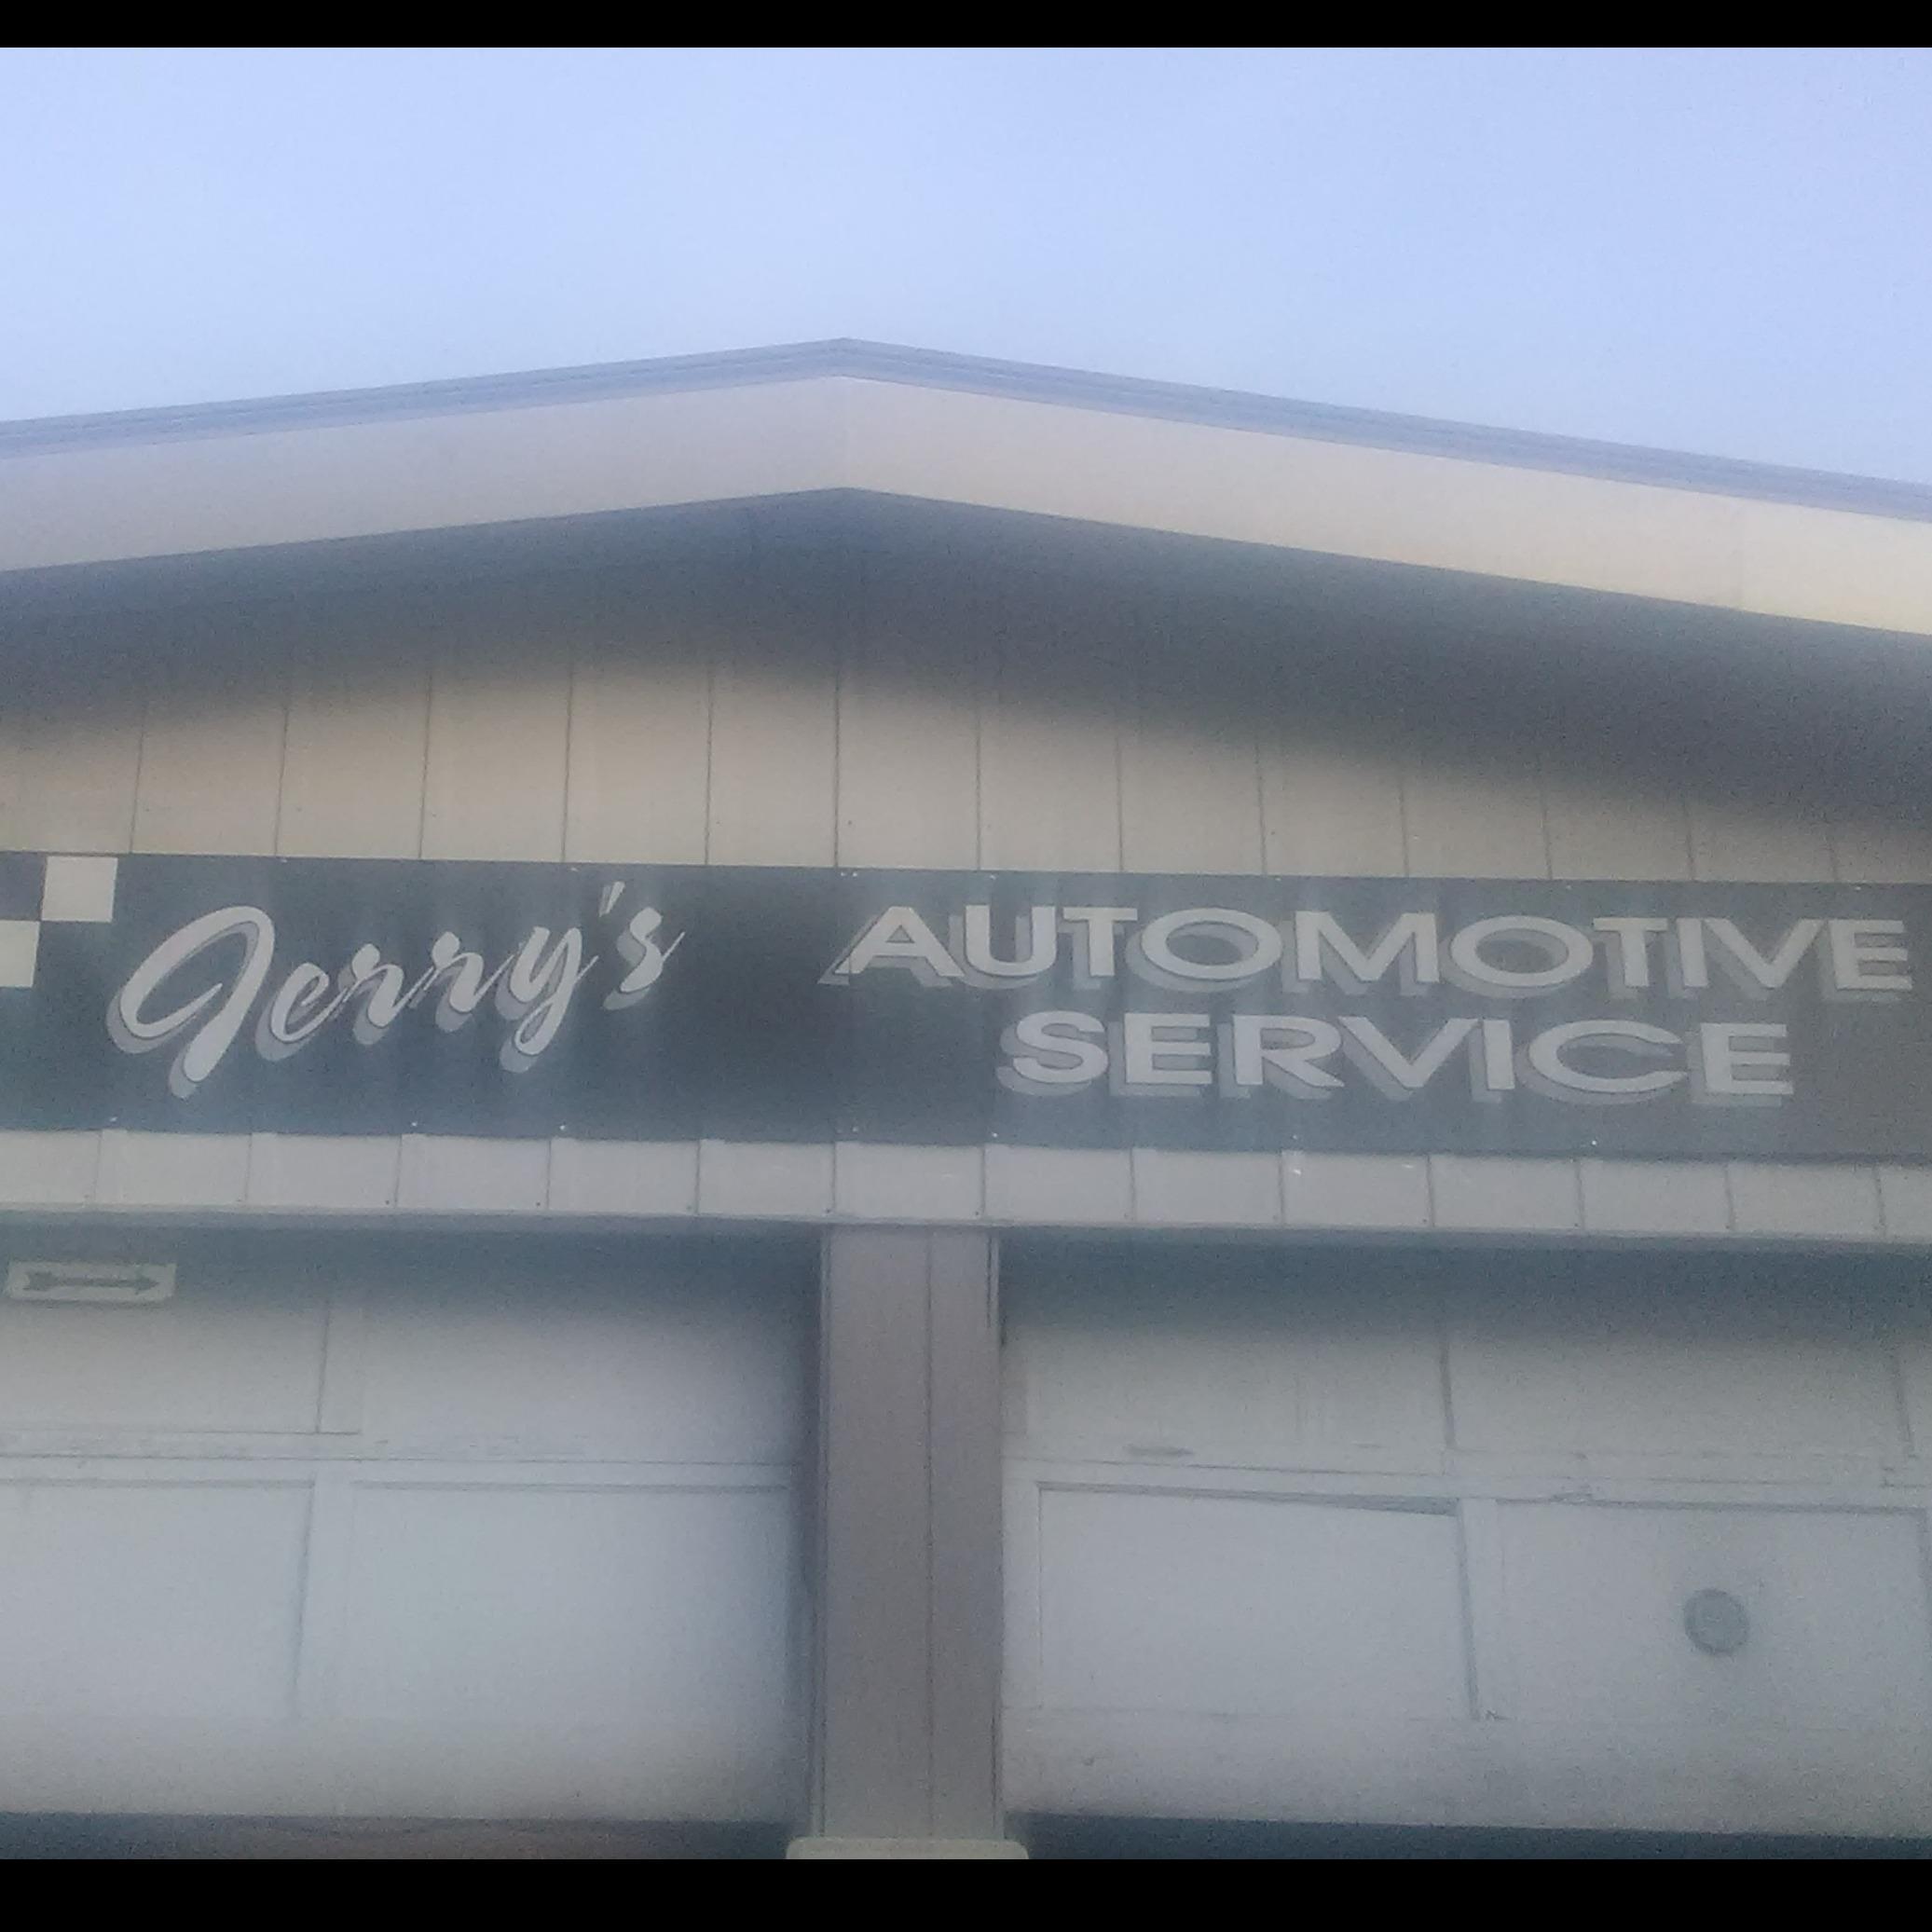 Jerry's Automotive Service Center image 1